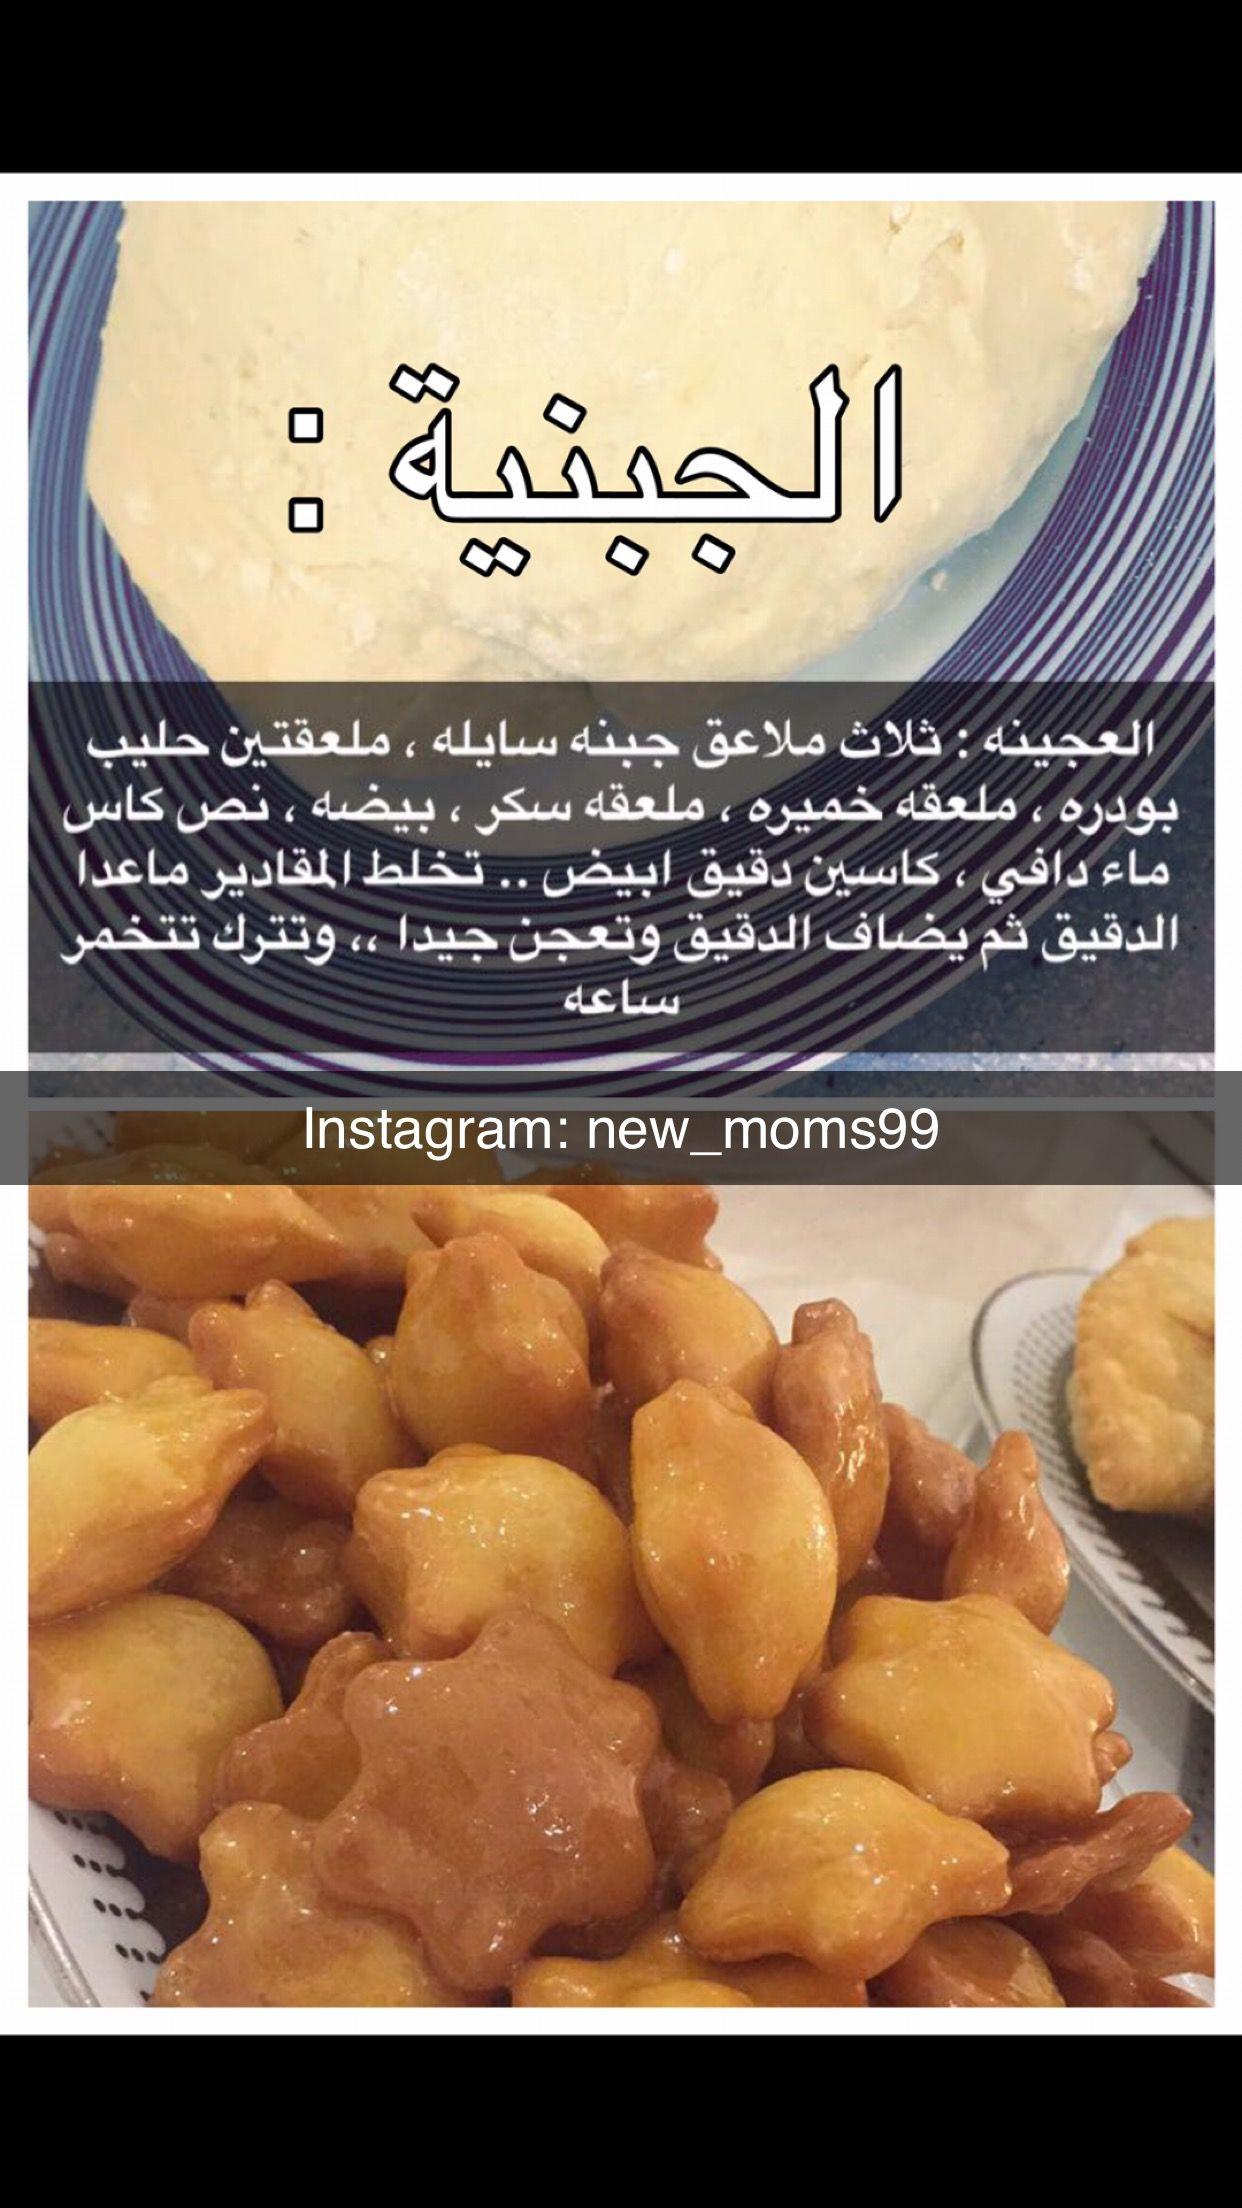 الجبنية Recipes Tunisian Food Cooking Recipes